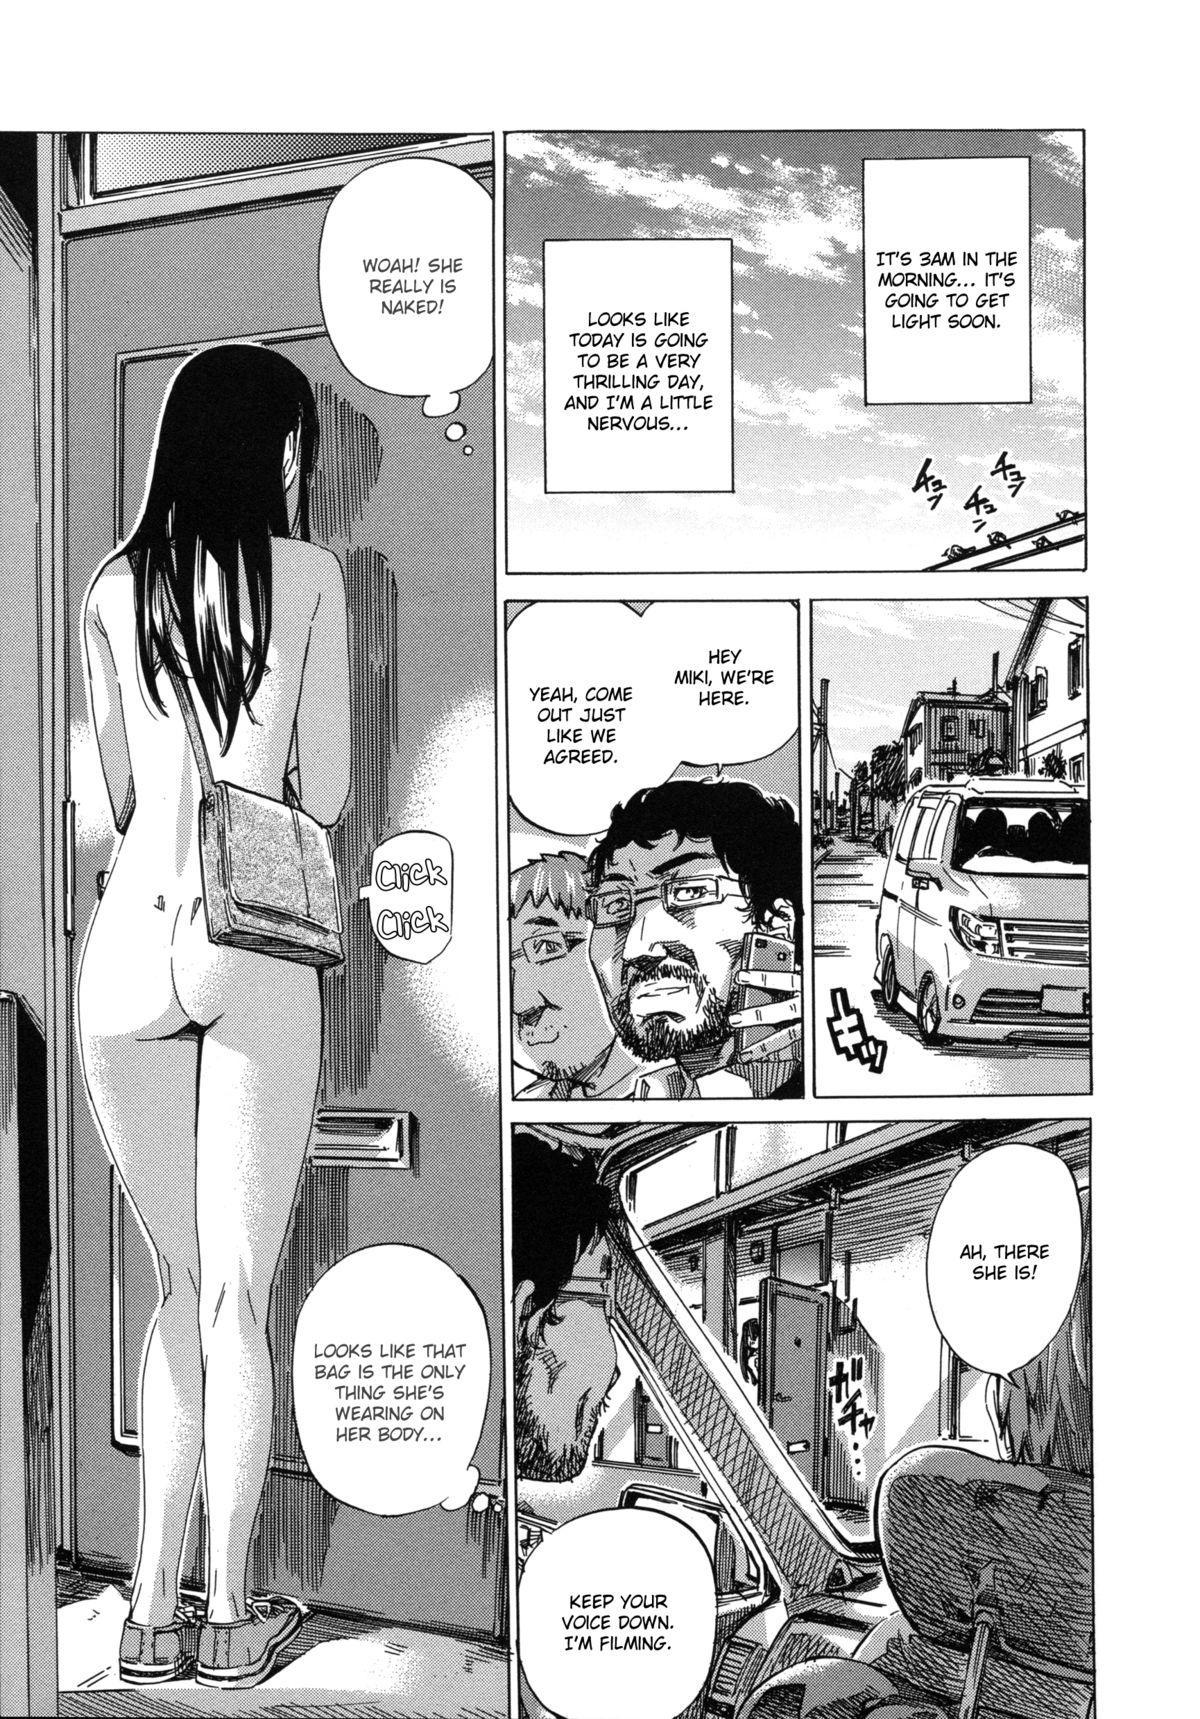 Kashiwazaki Miki wa Ironna Basho de Zenra Sanpo Shitemita | Miki Kashiwazaki Goes Naked in All Sorts of Places 191